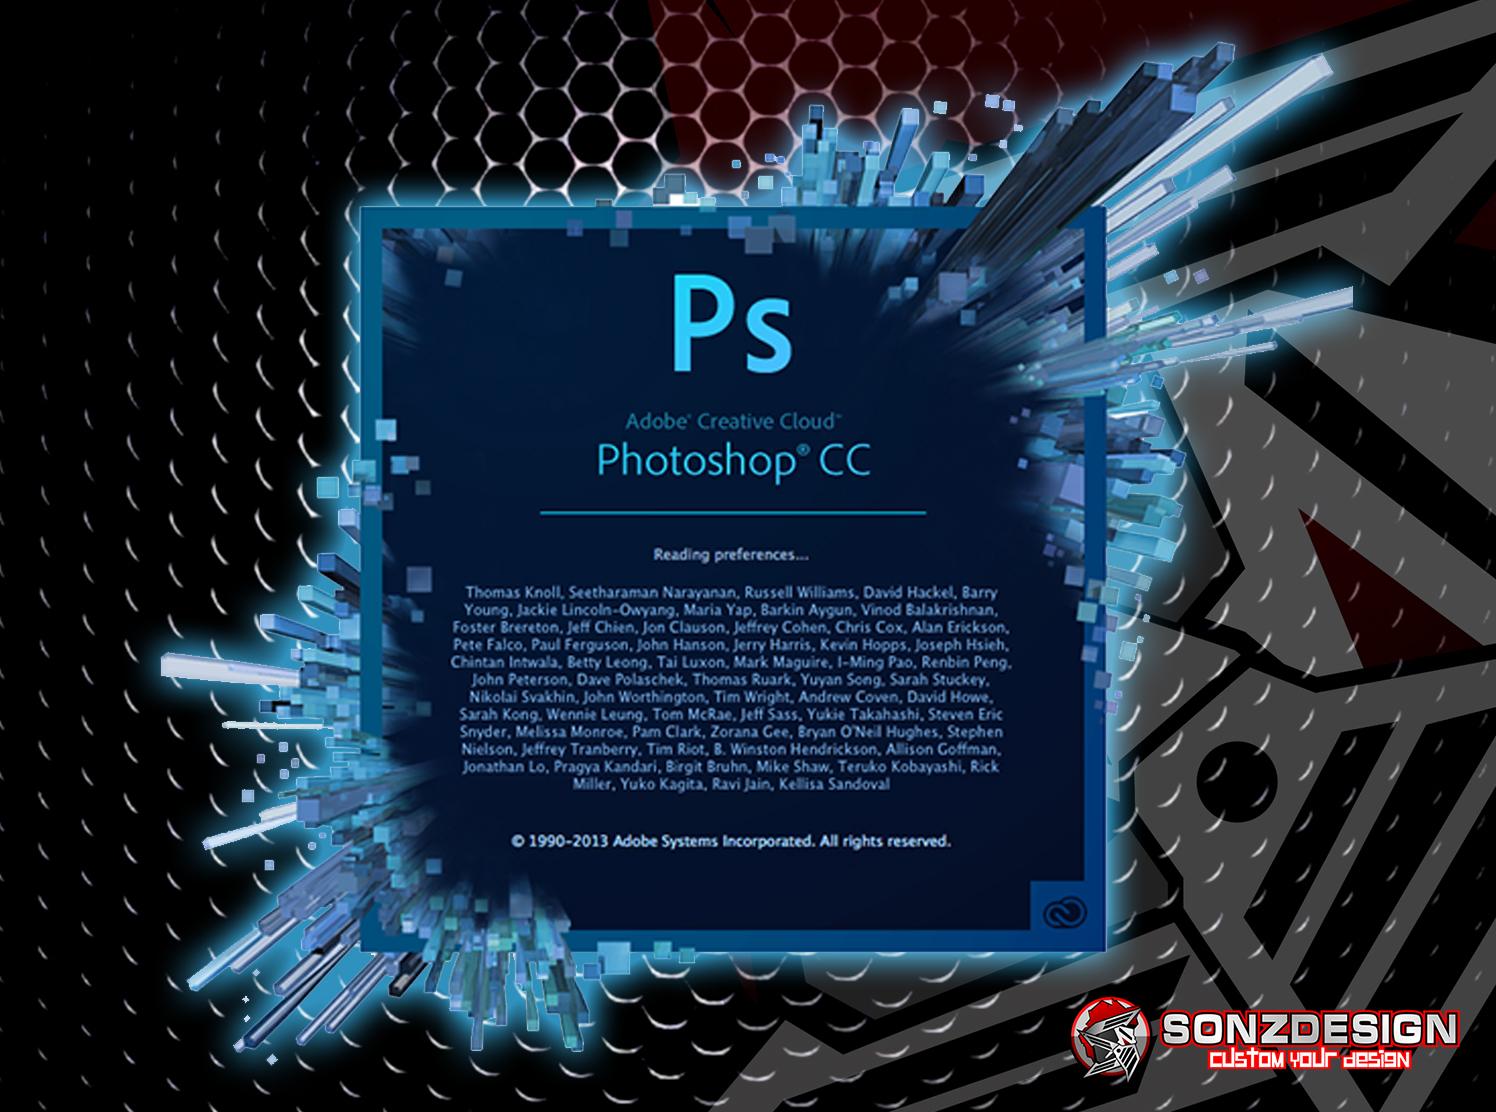 Download Adobe Photoshop Cc 2017 Sonzdesign Indonesian Gaming Design Platforms